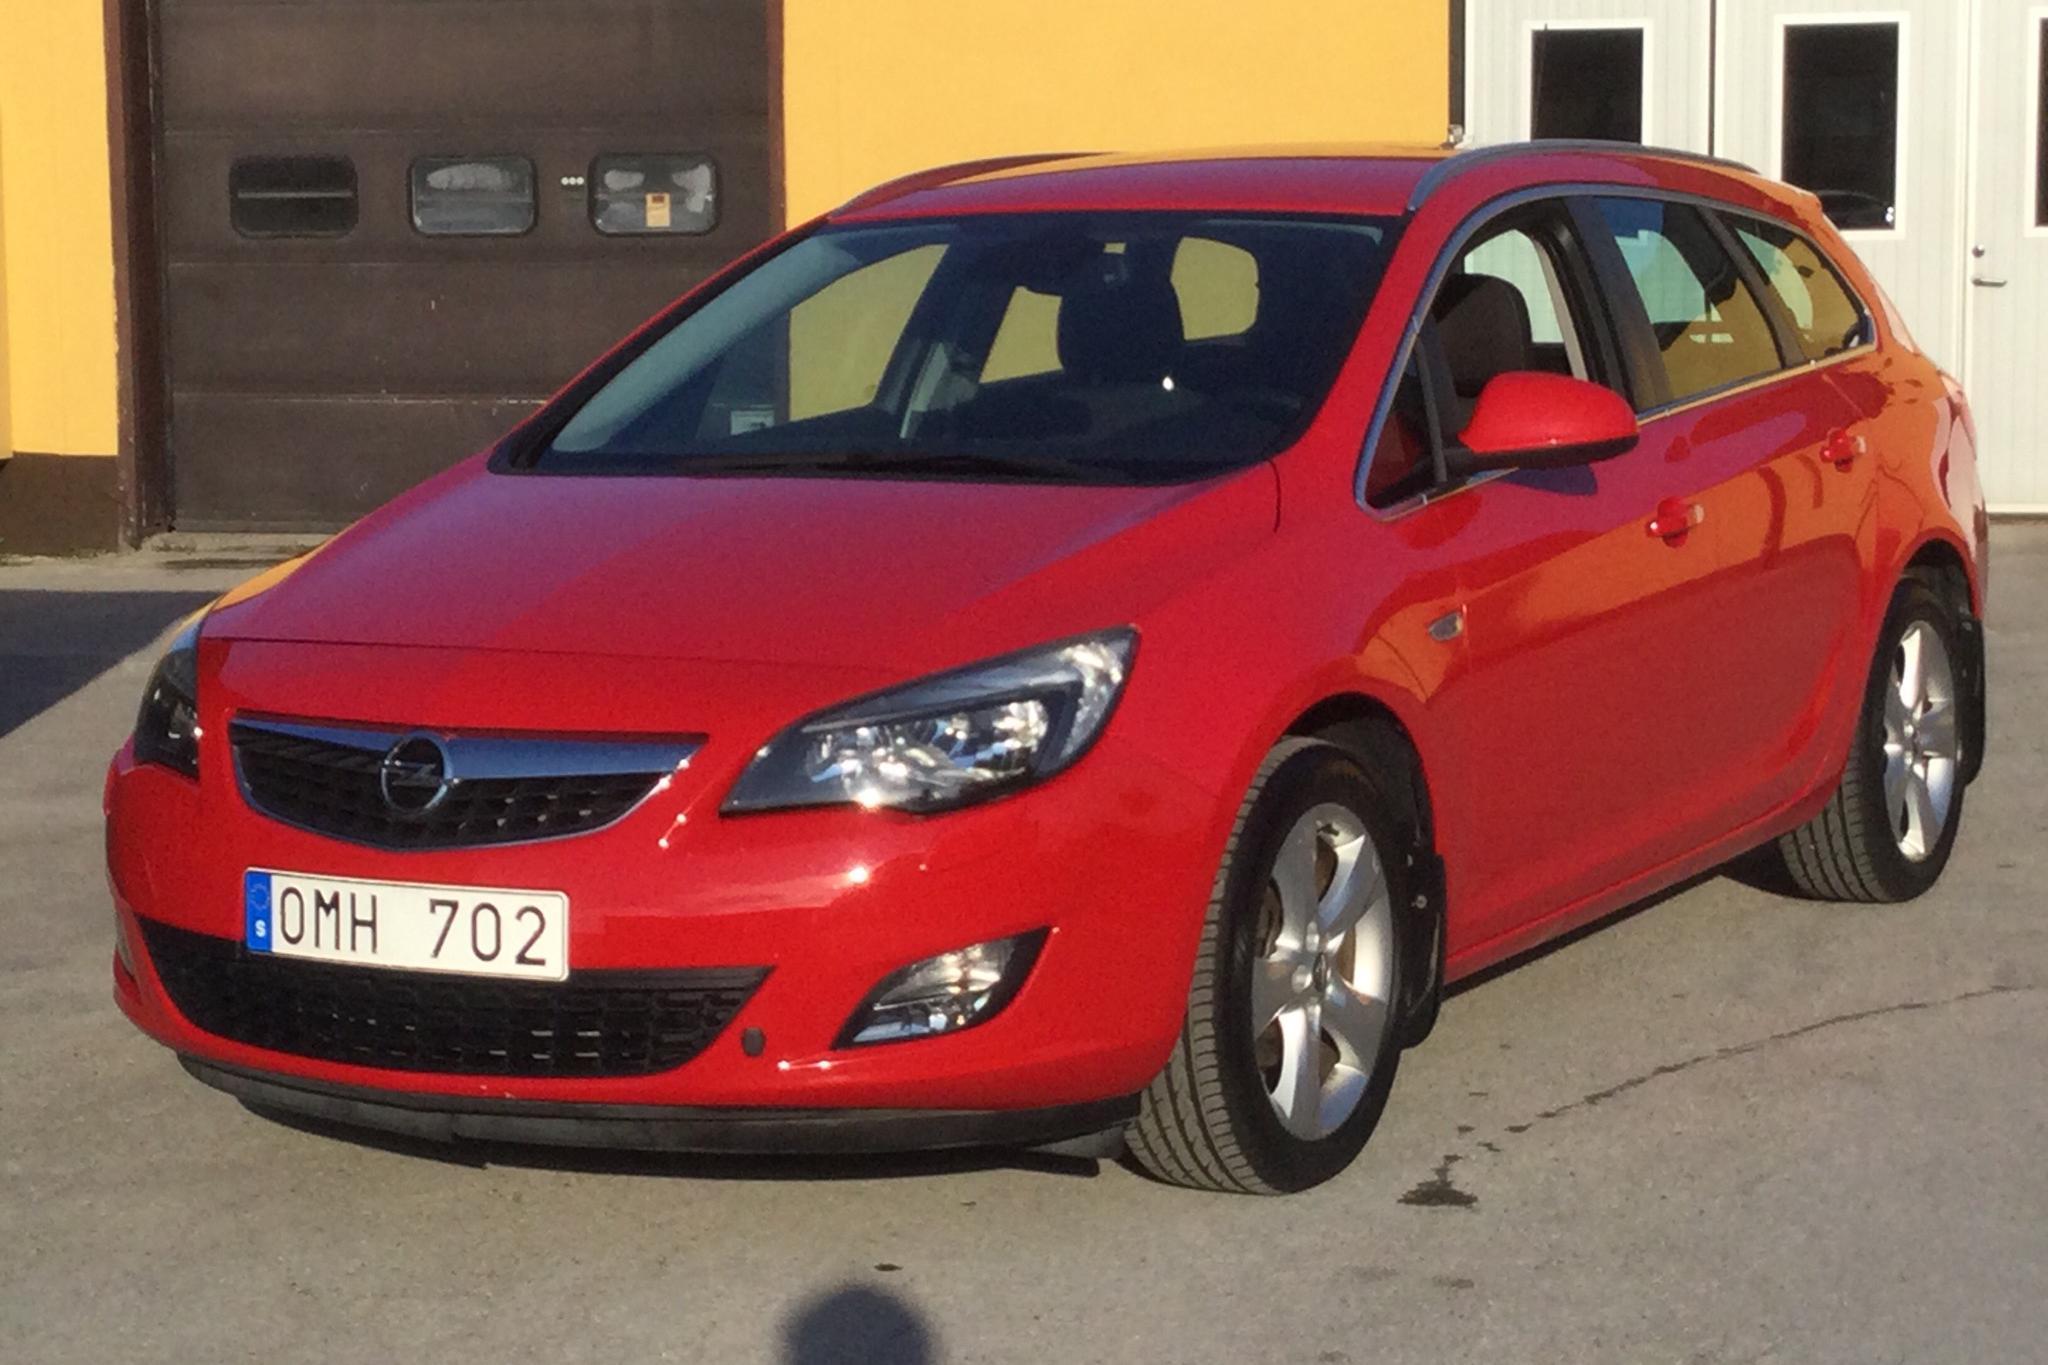 Opel Astra 1.4 Turbo ECOTEC Sports Tourer (140hk) - 3 839 mil - Manuell - röd - 2011